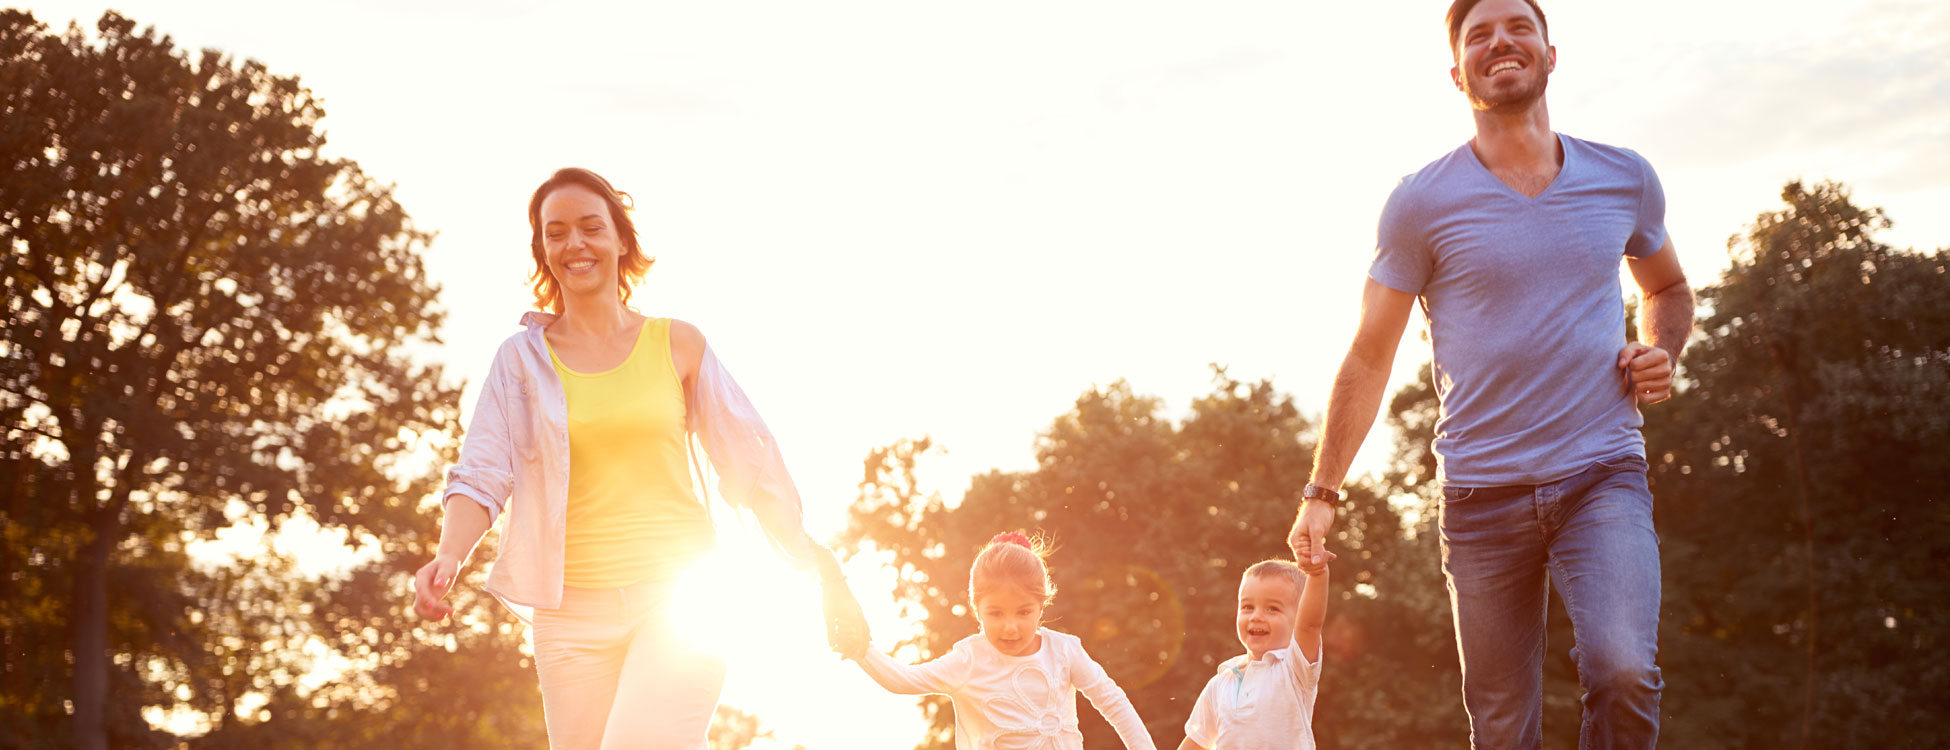 Chiropractor North Brisbane Happy Running Family